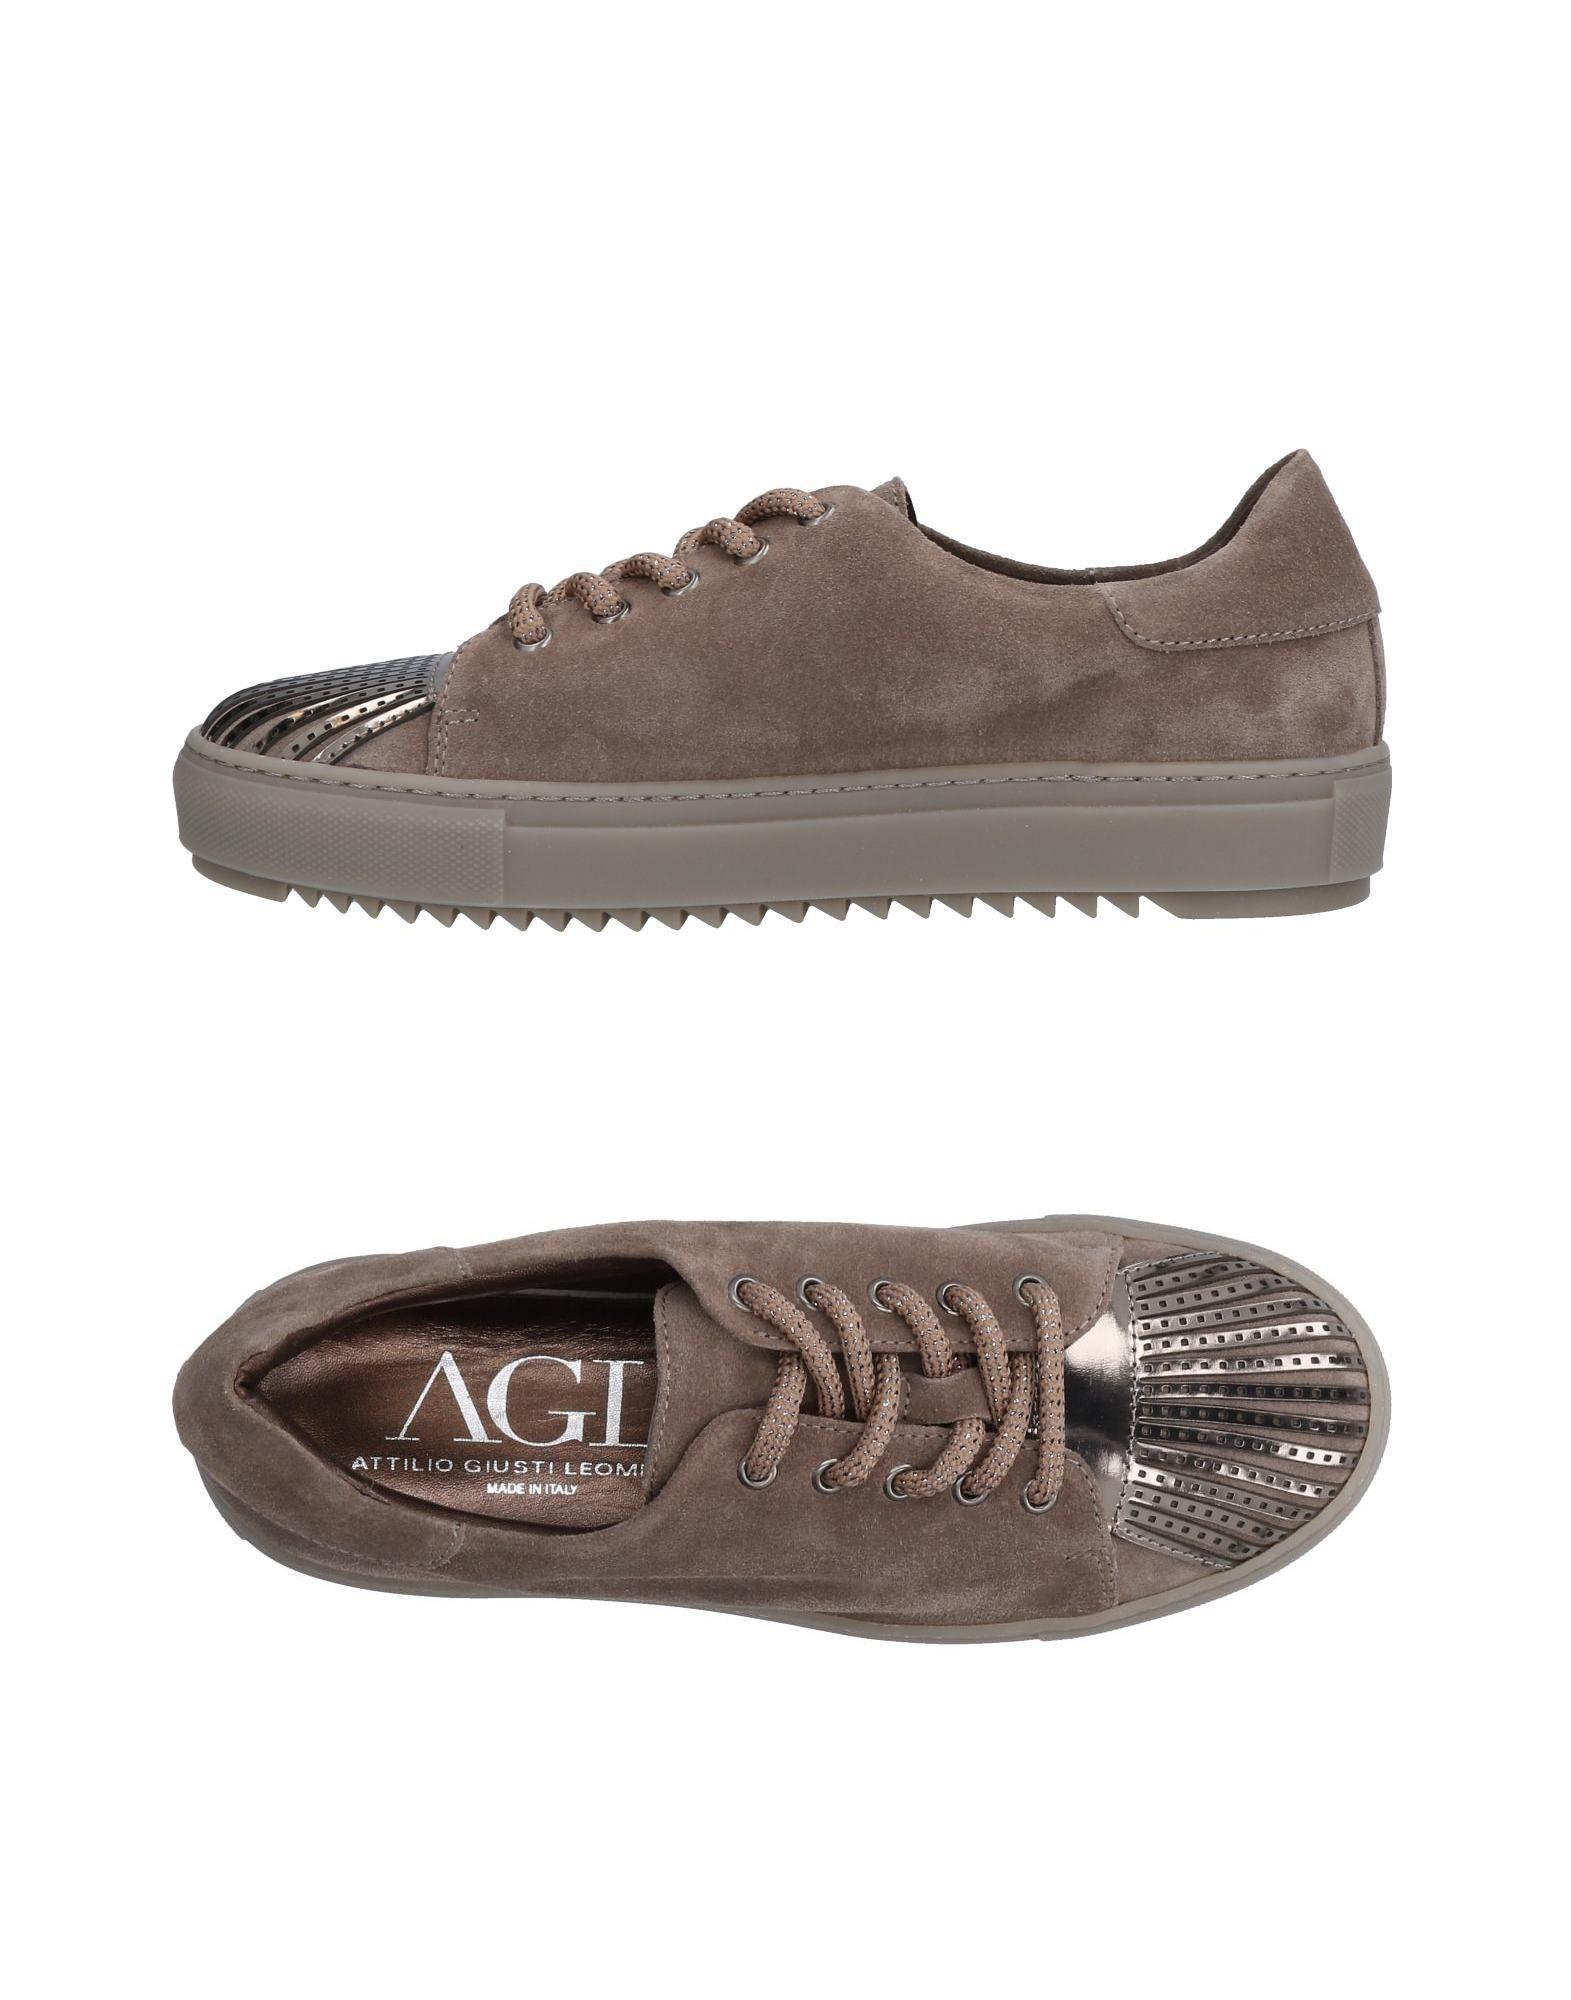 Agl Attilio Giusti Leombruni Bas-tops Et Chaussures De Sport EOo9l4SqJ